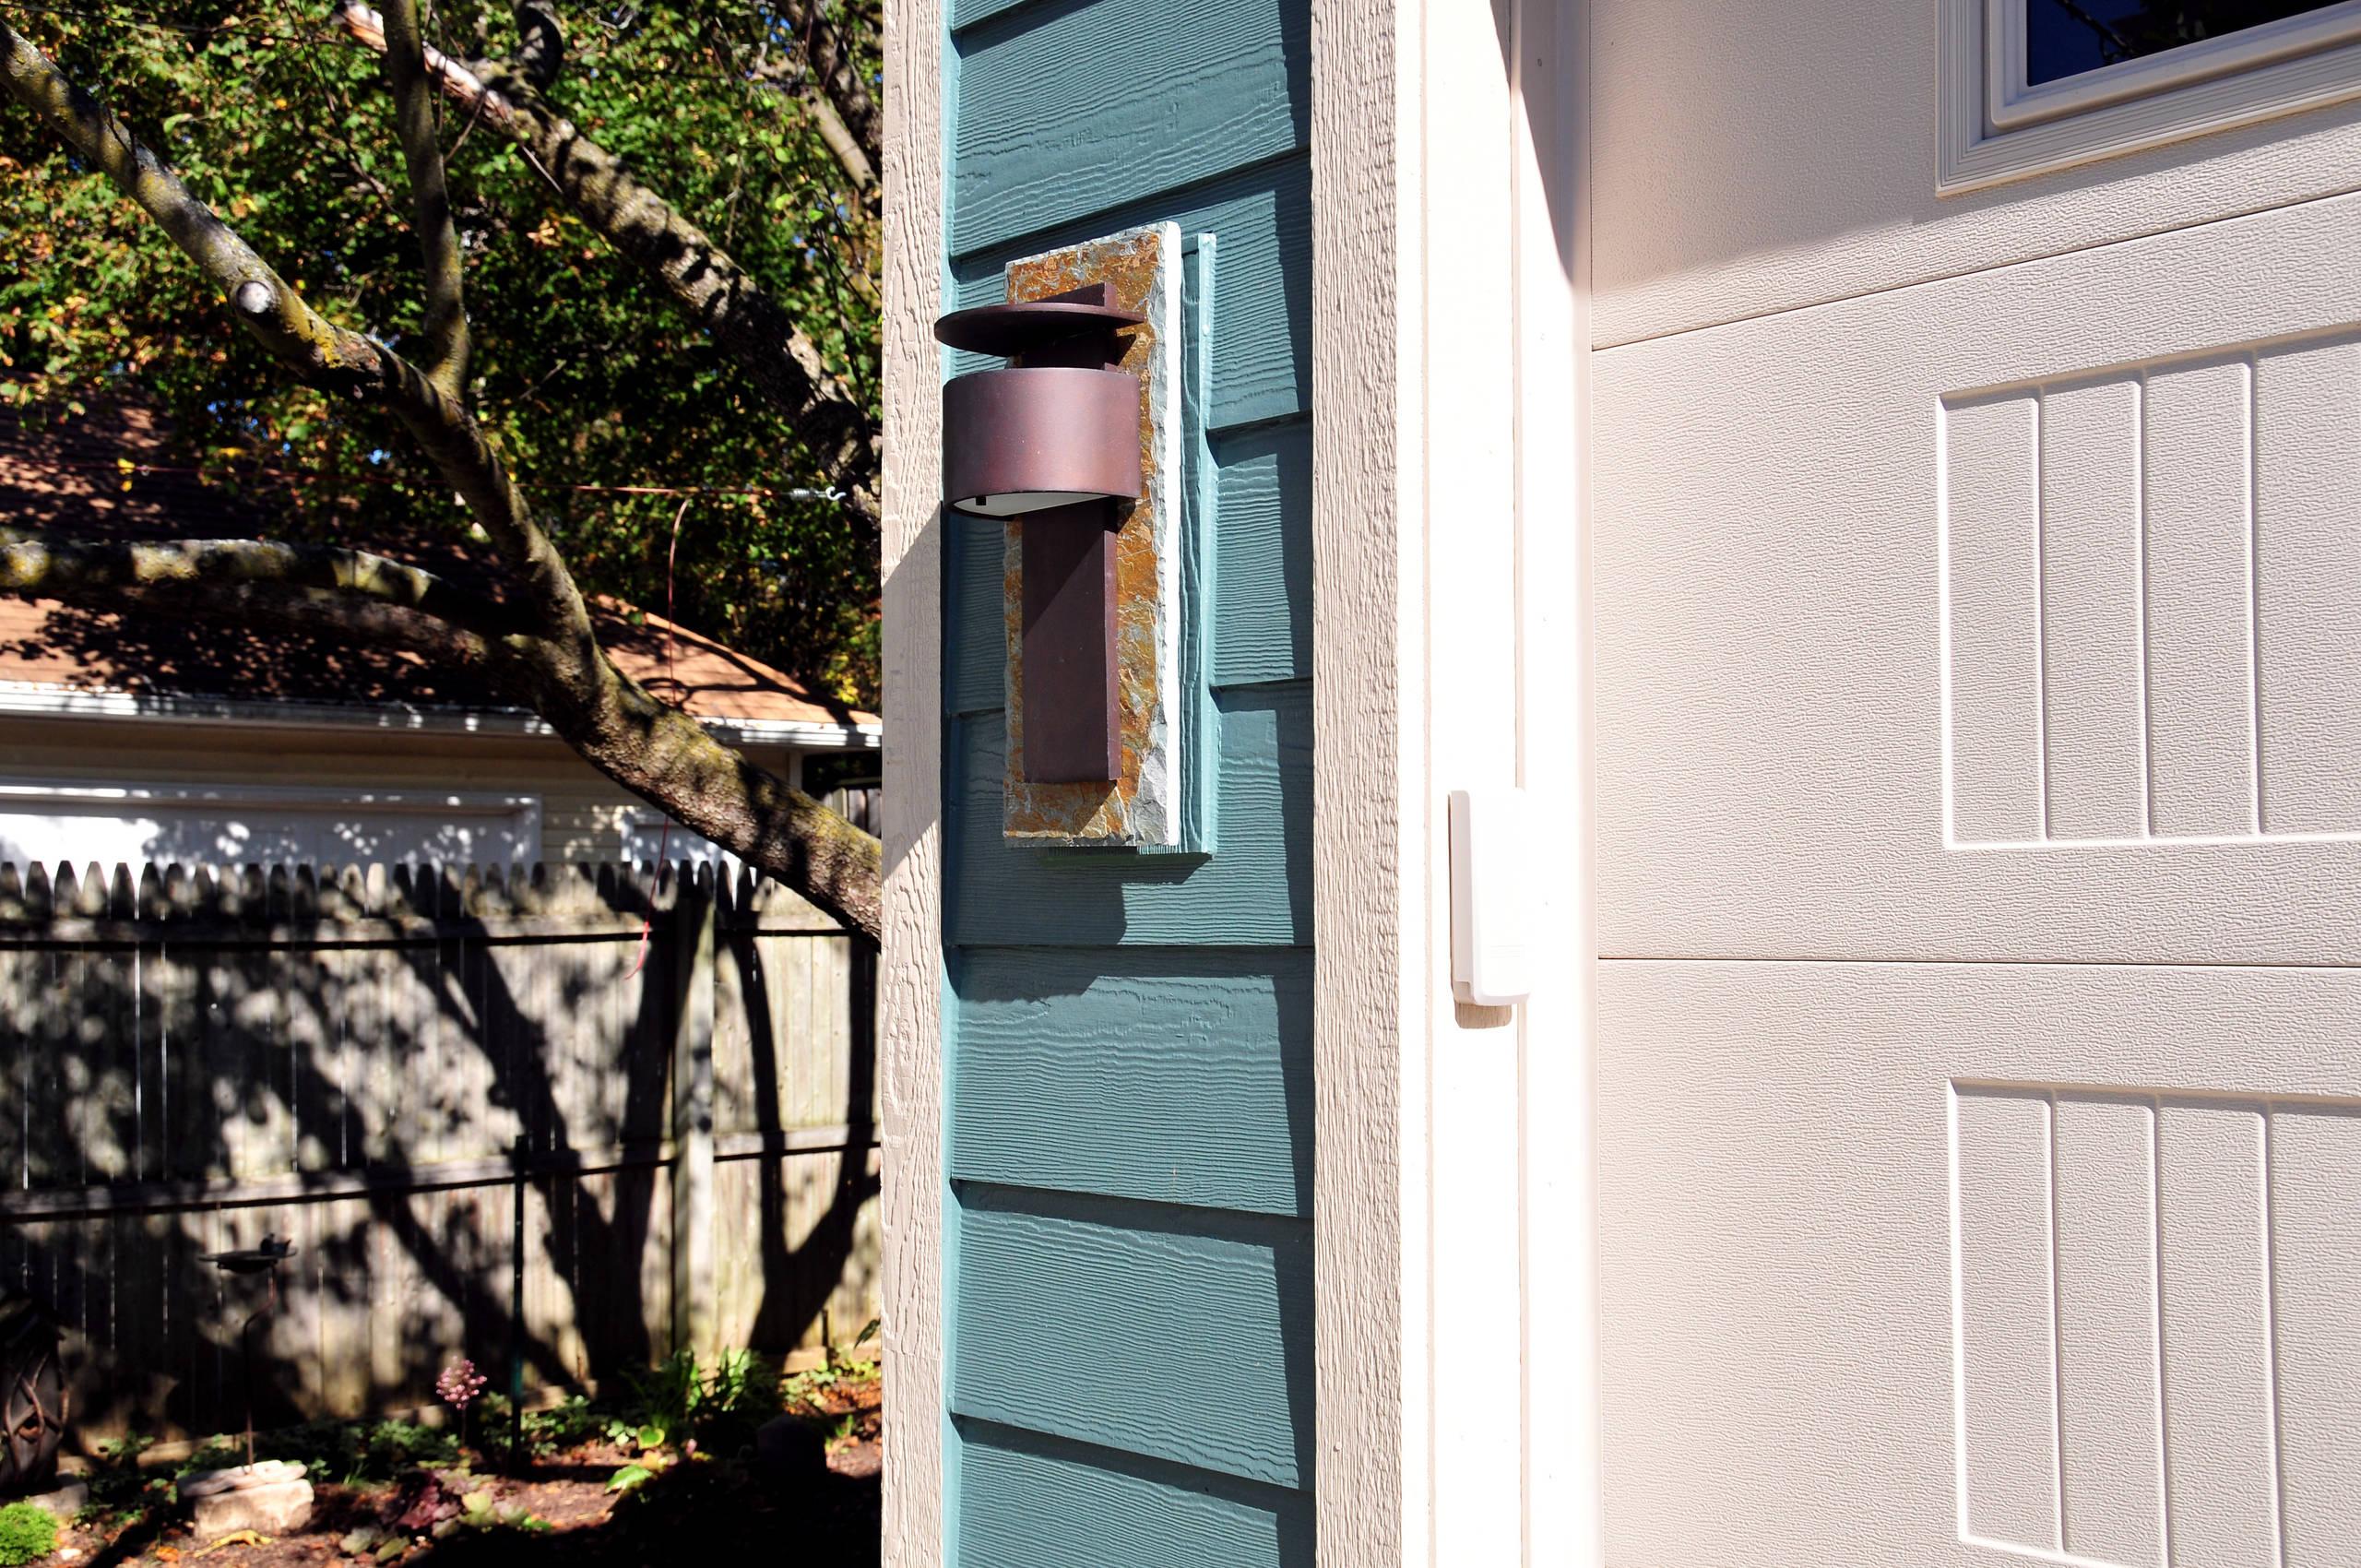 Shorewood House Renovation: Garage, 2 Baths, Living, Kitchen & Landscaping